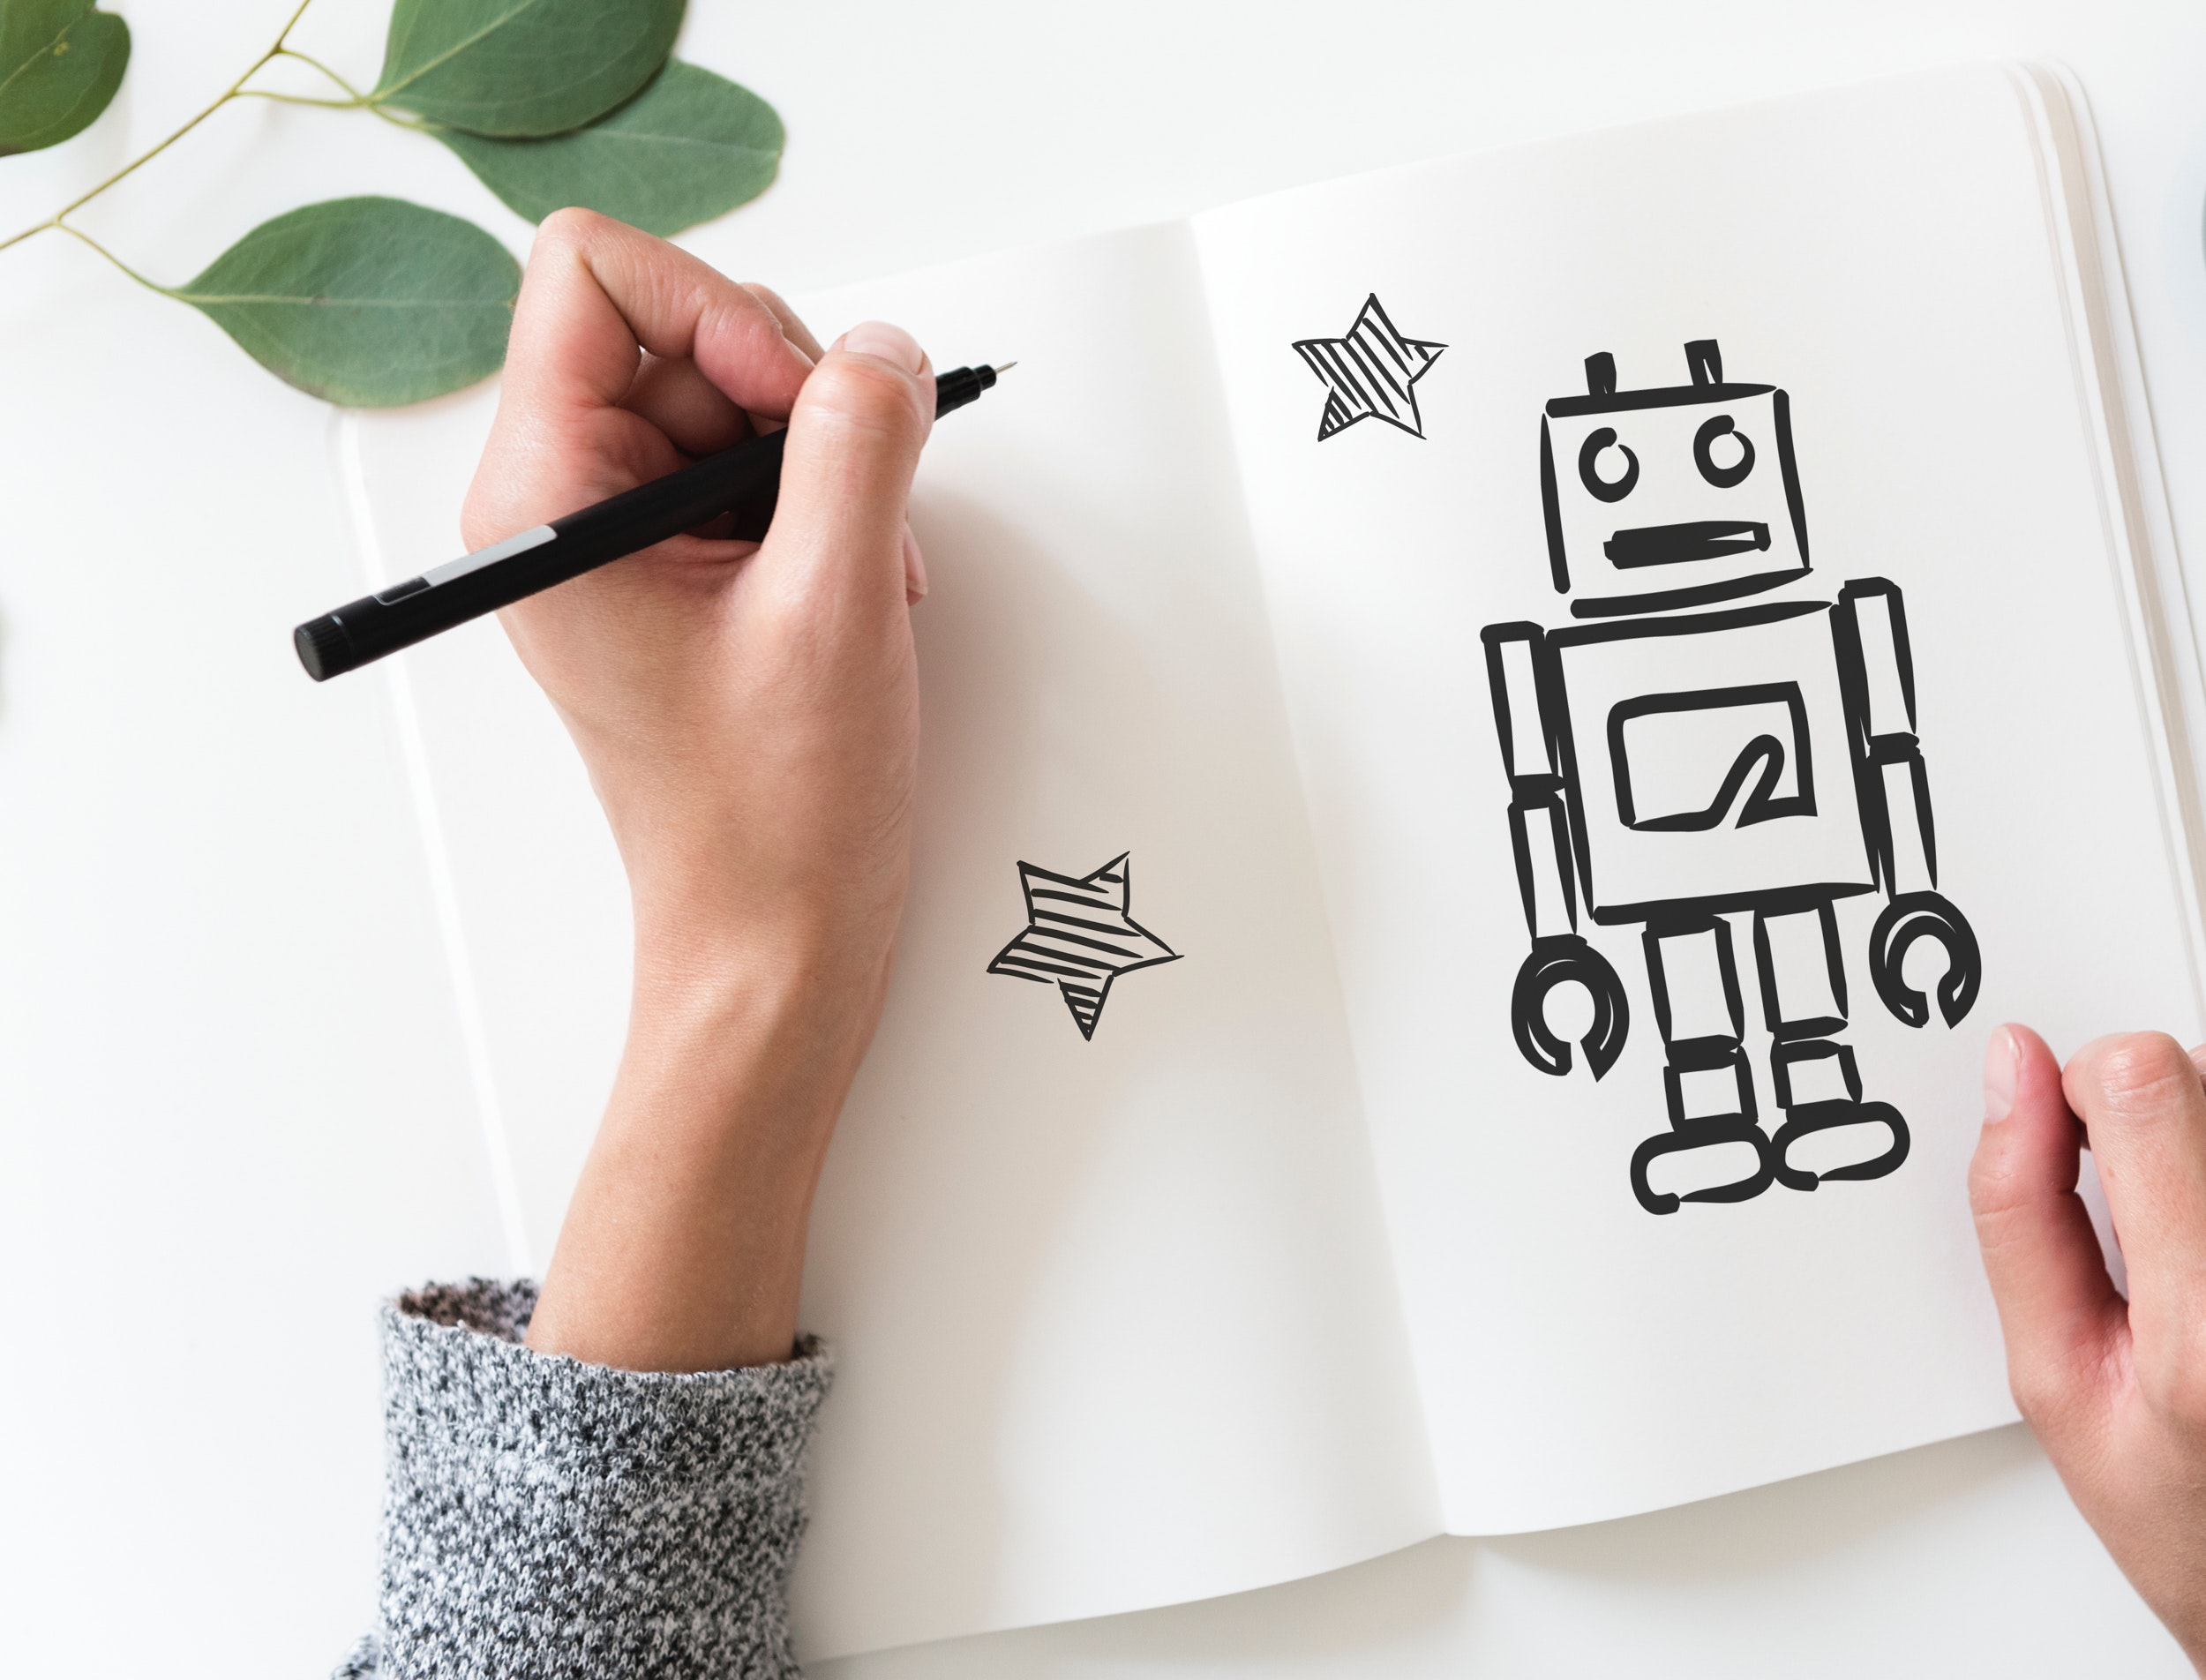 adult-artificial-intelligence-bot-1020325.jpg